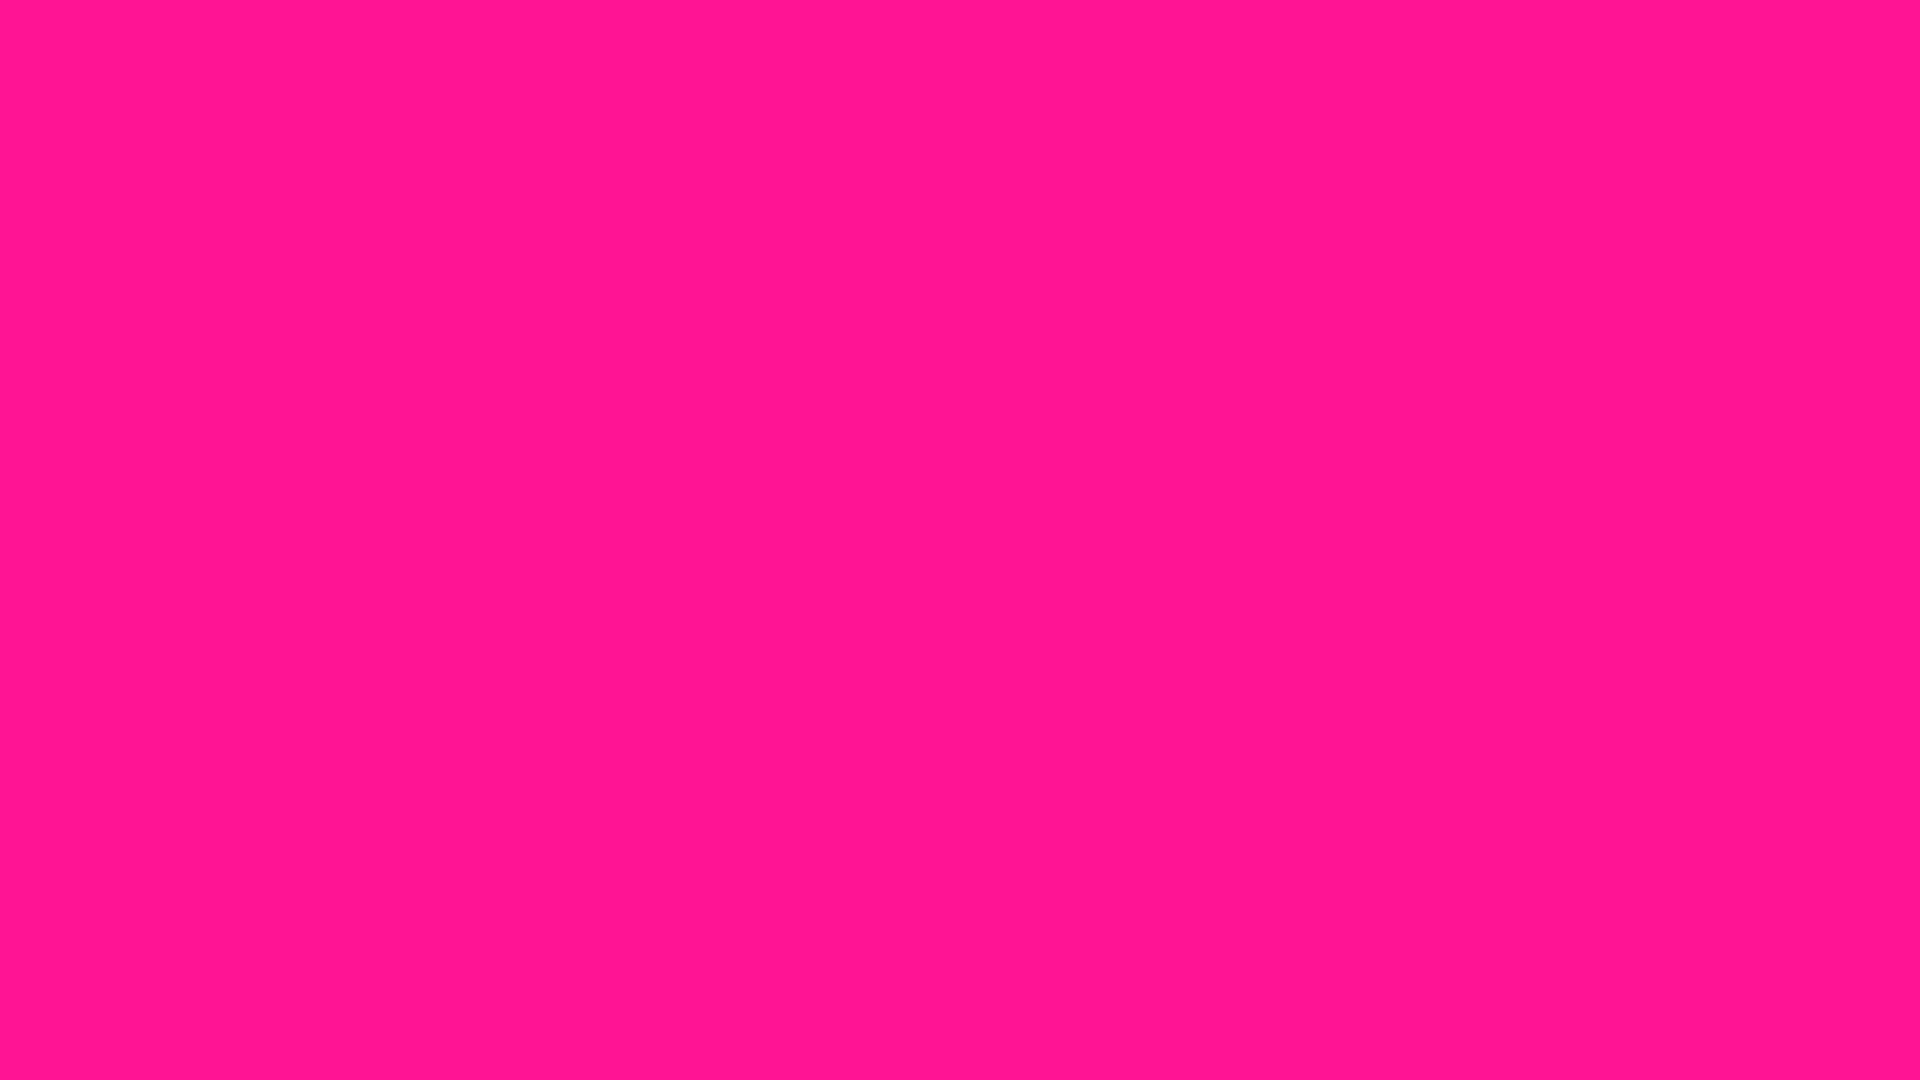 Pink Color Background Wallpapersafari